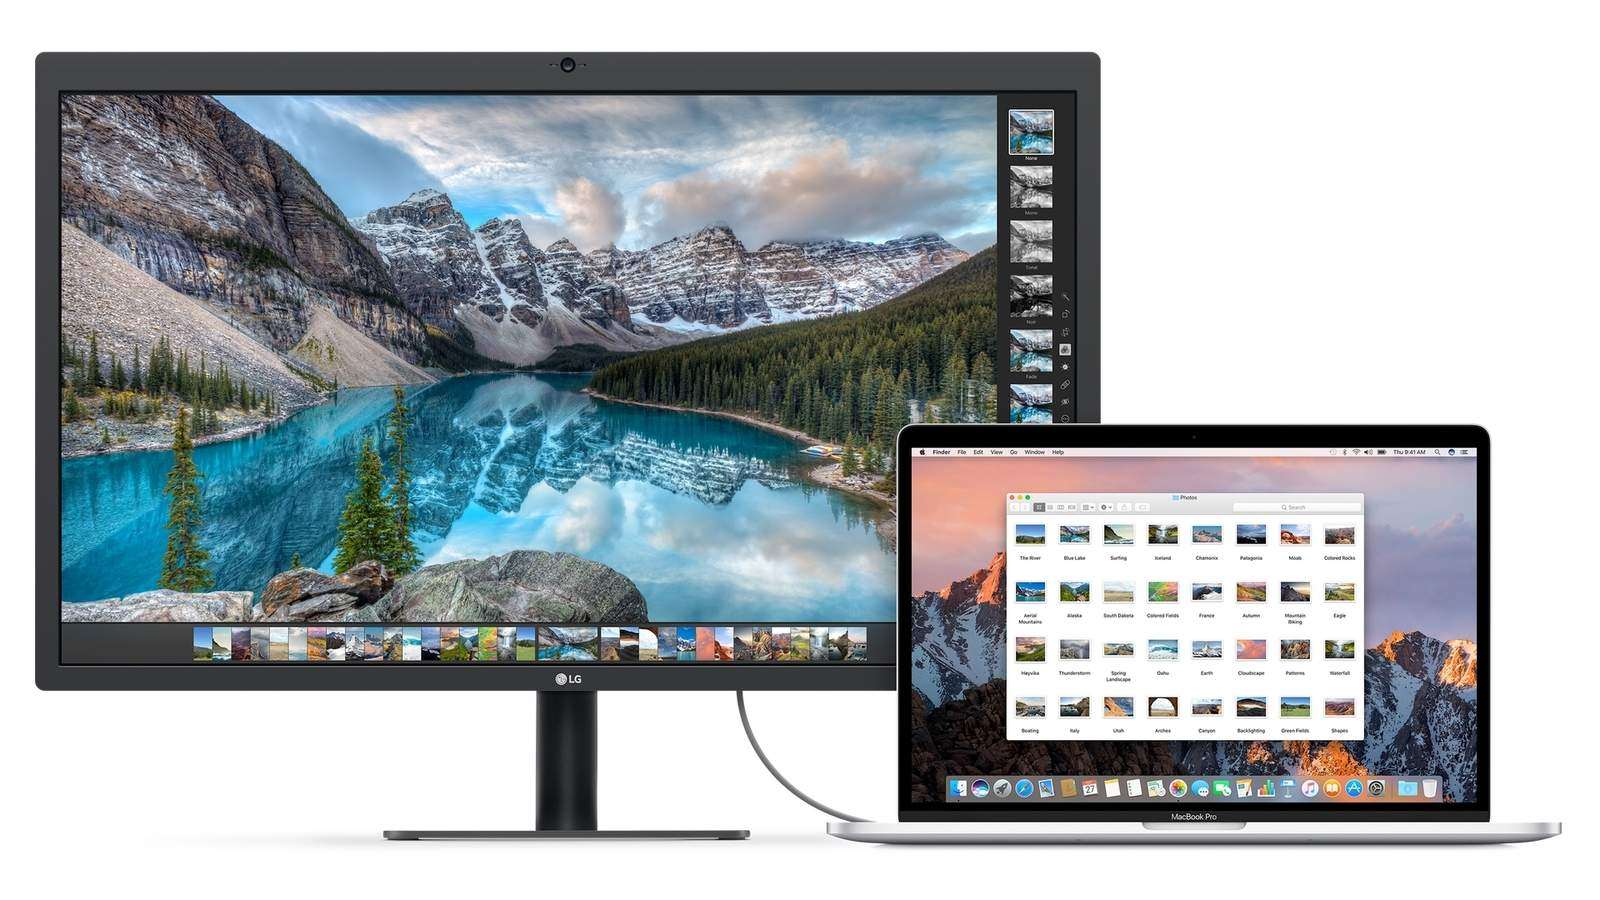 LG 承認 UltraFine 5K 螢幕出現問題,提供解決方案